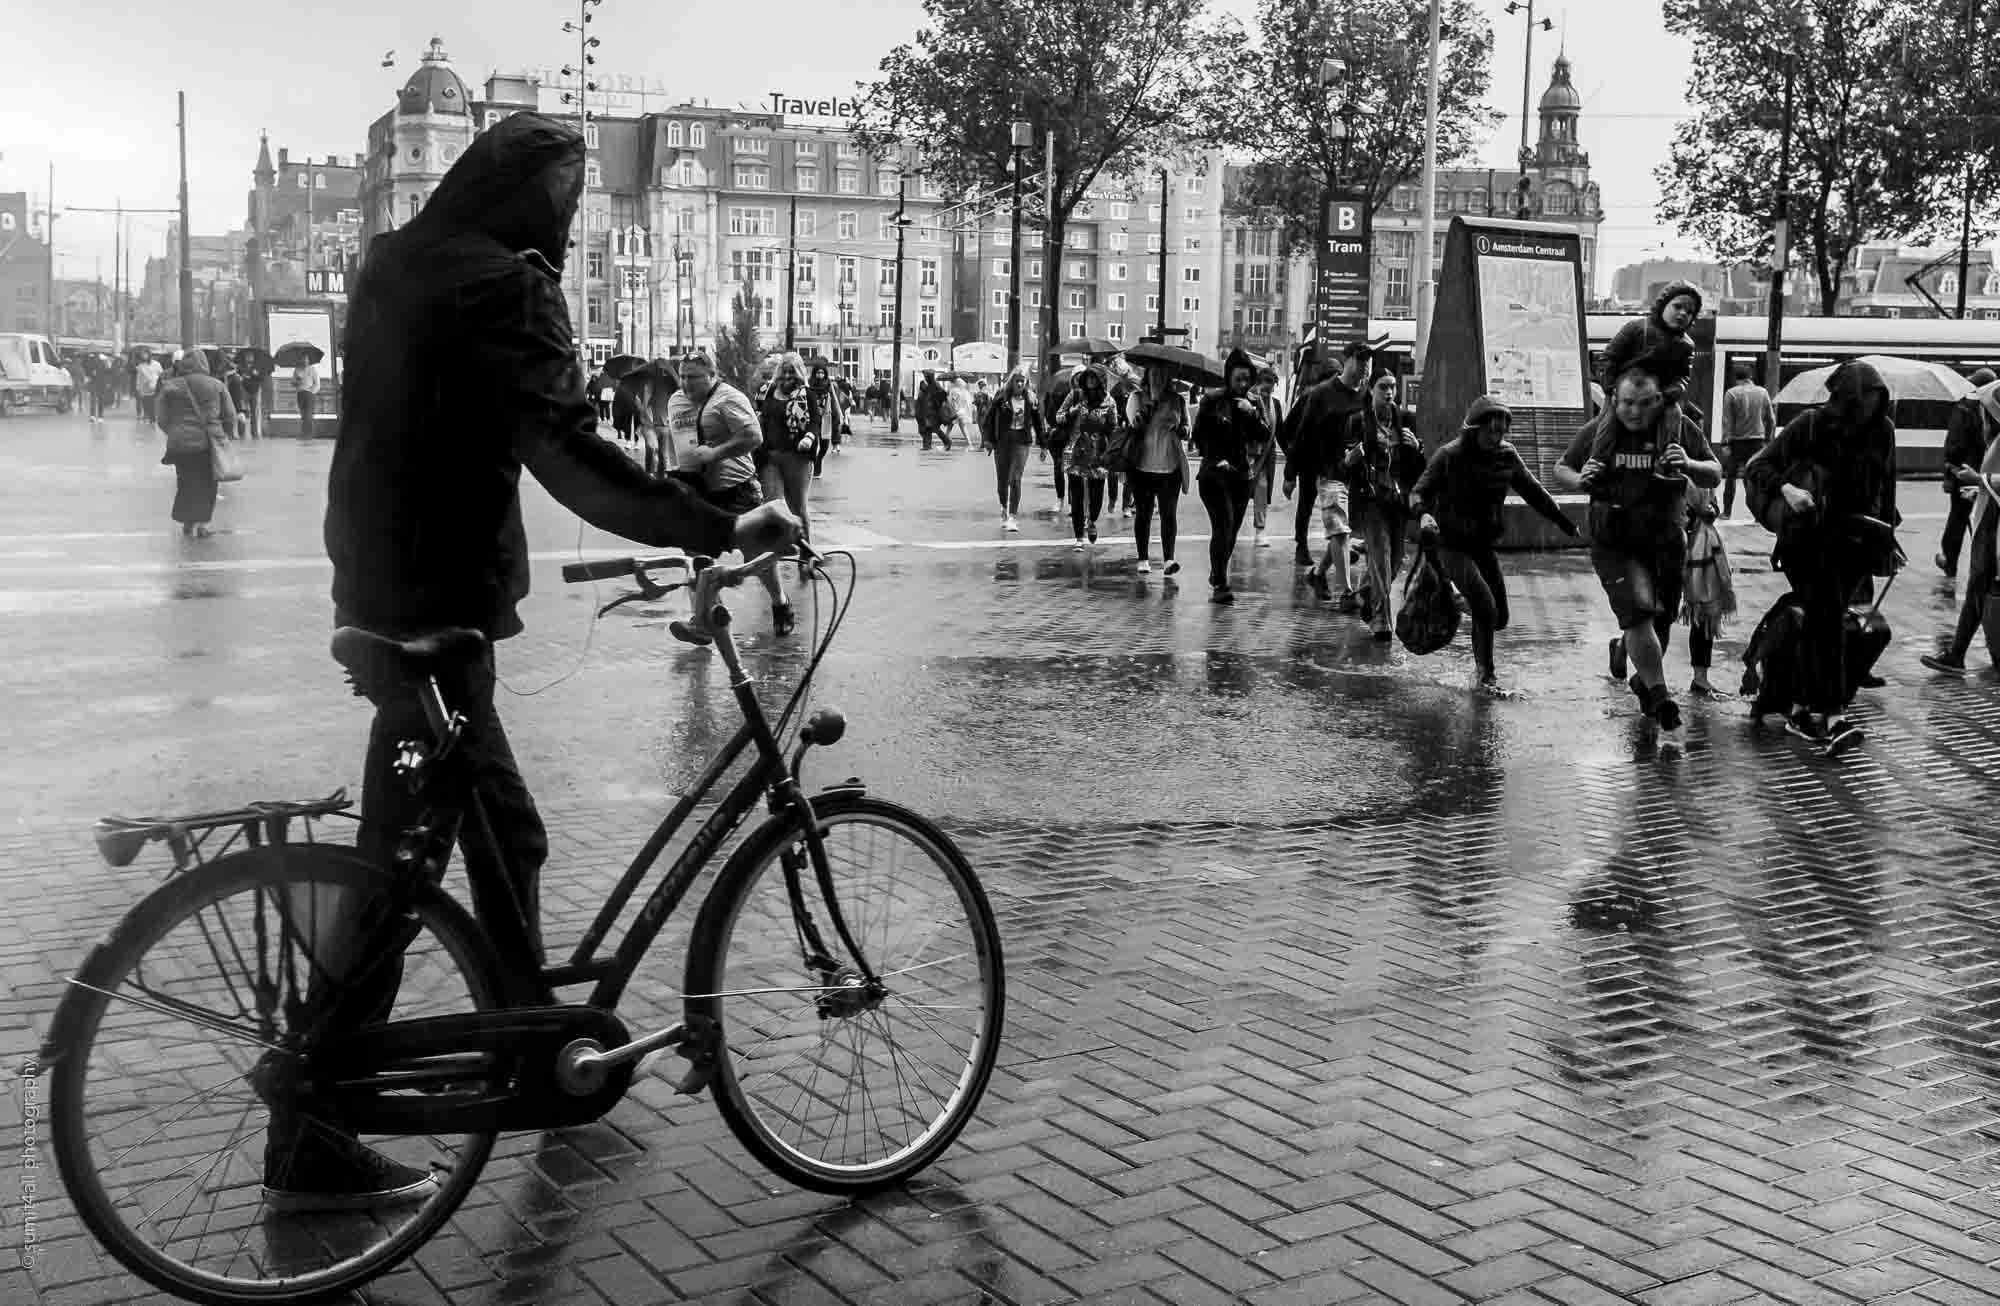 The Rain Is Always Around the Corner in Amsterdam